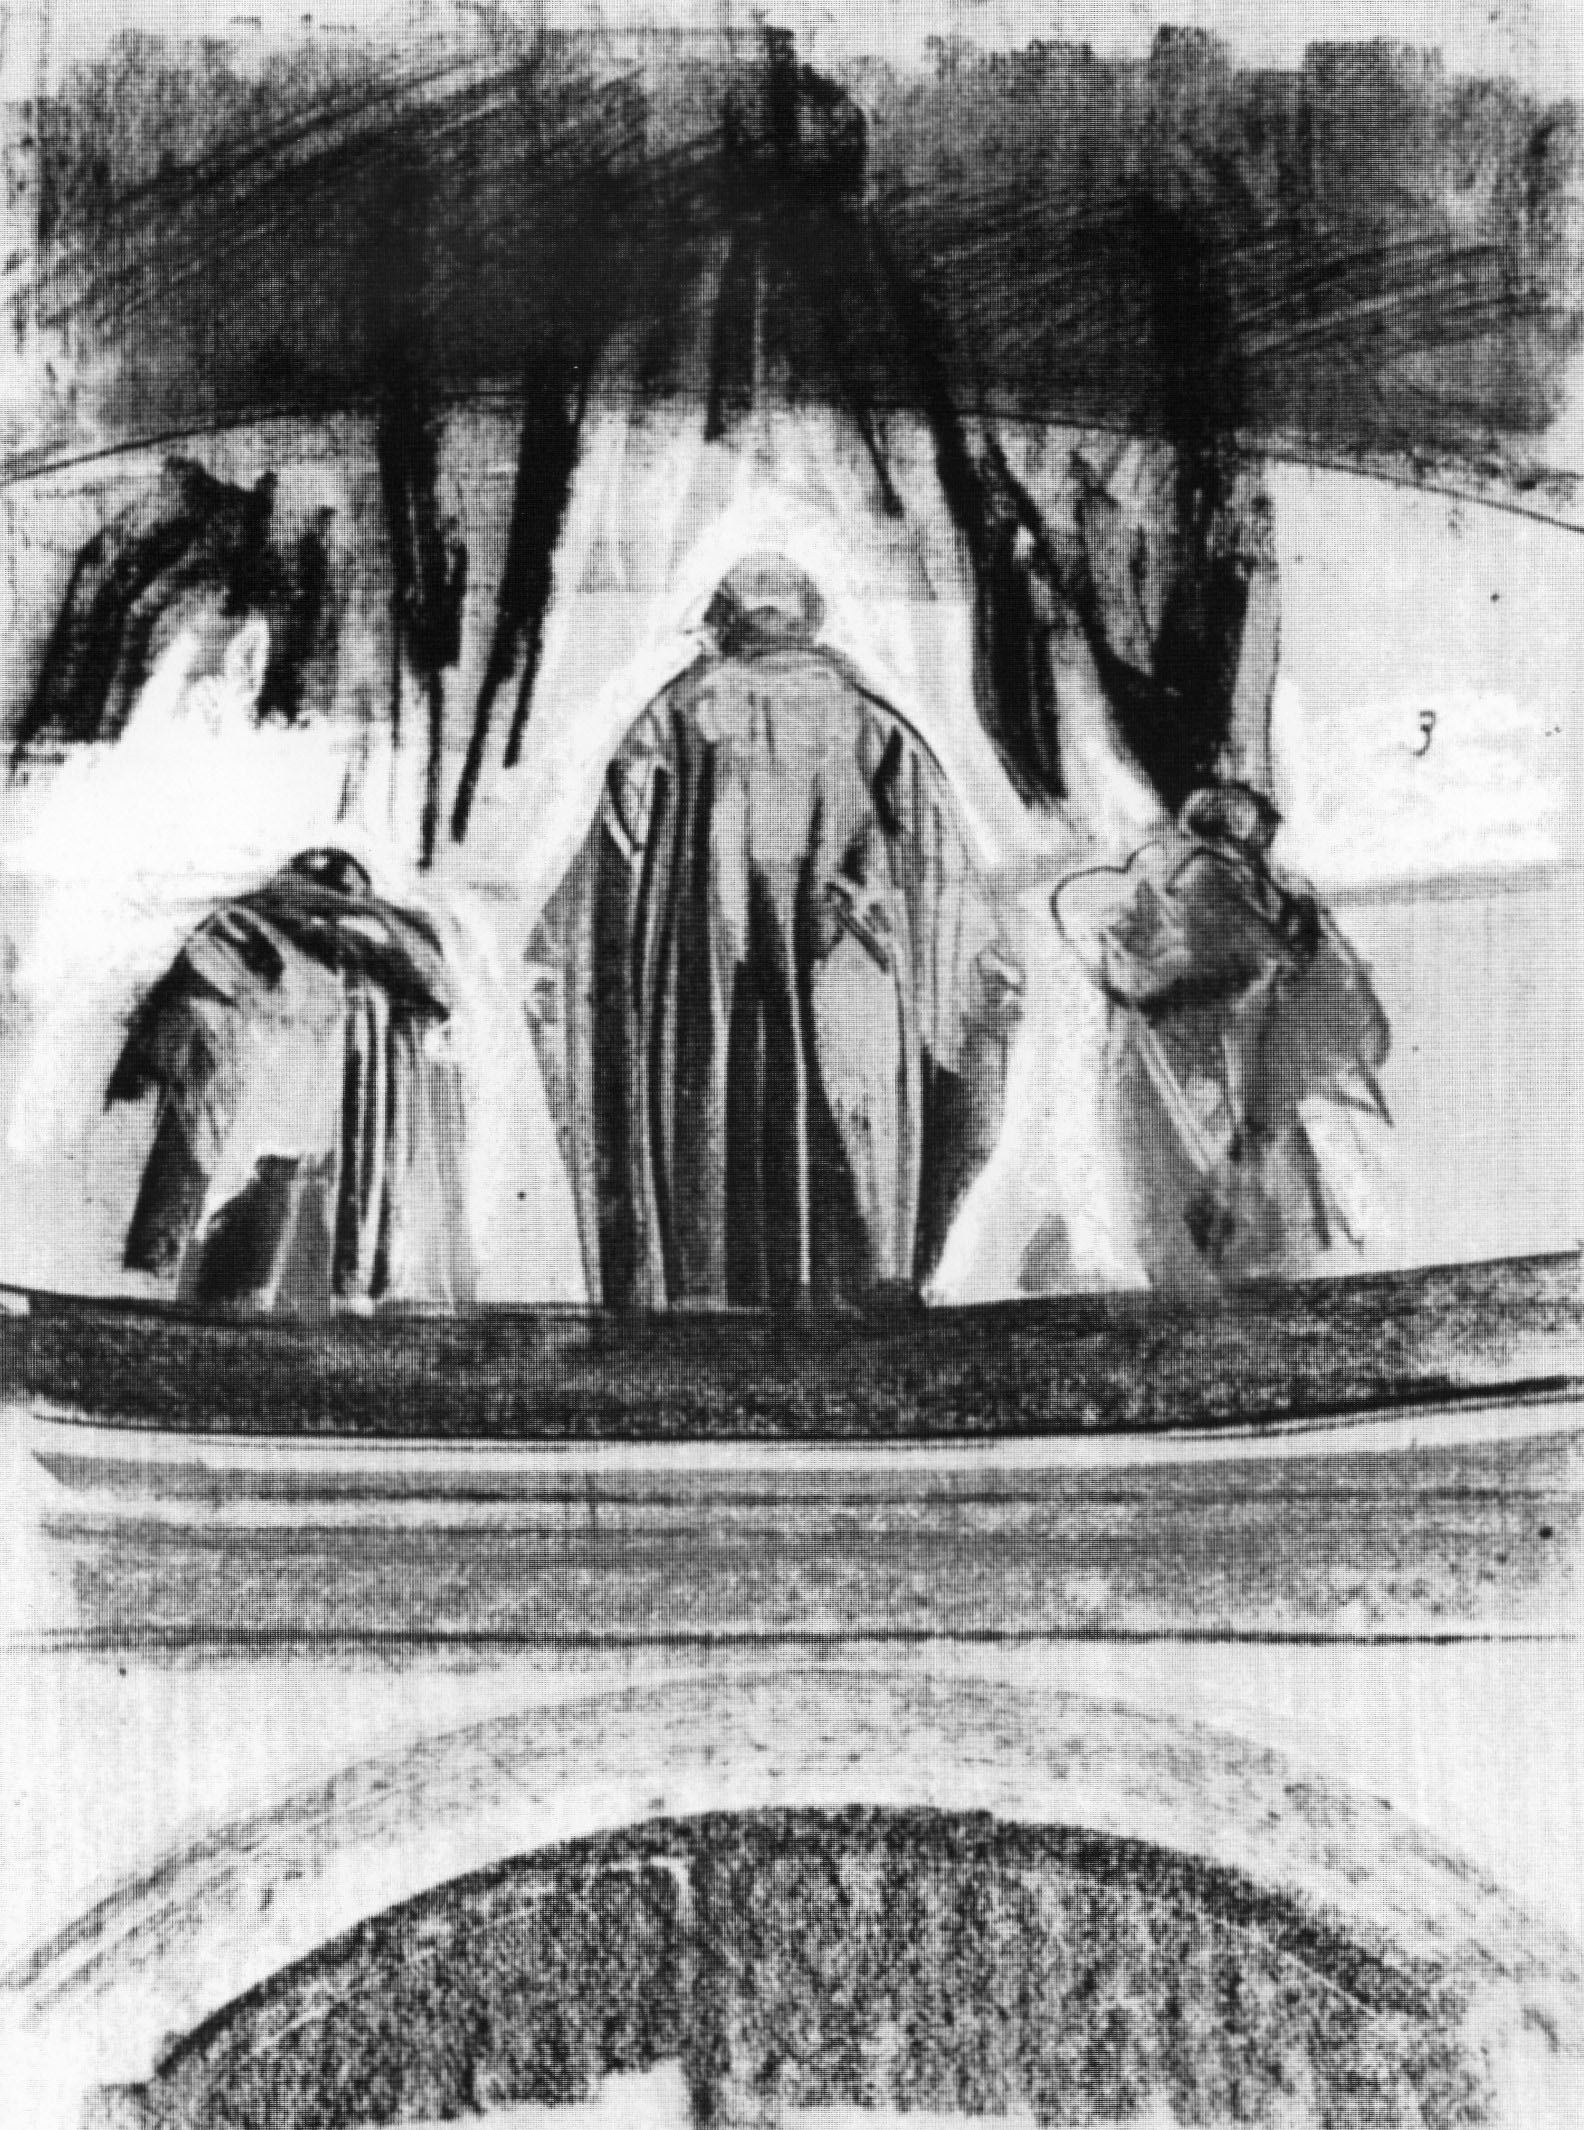 Pietro Annigon - Pentecoste